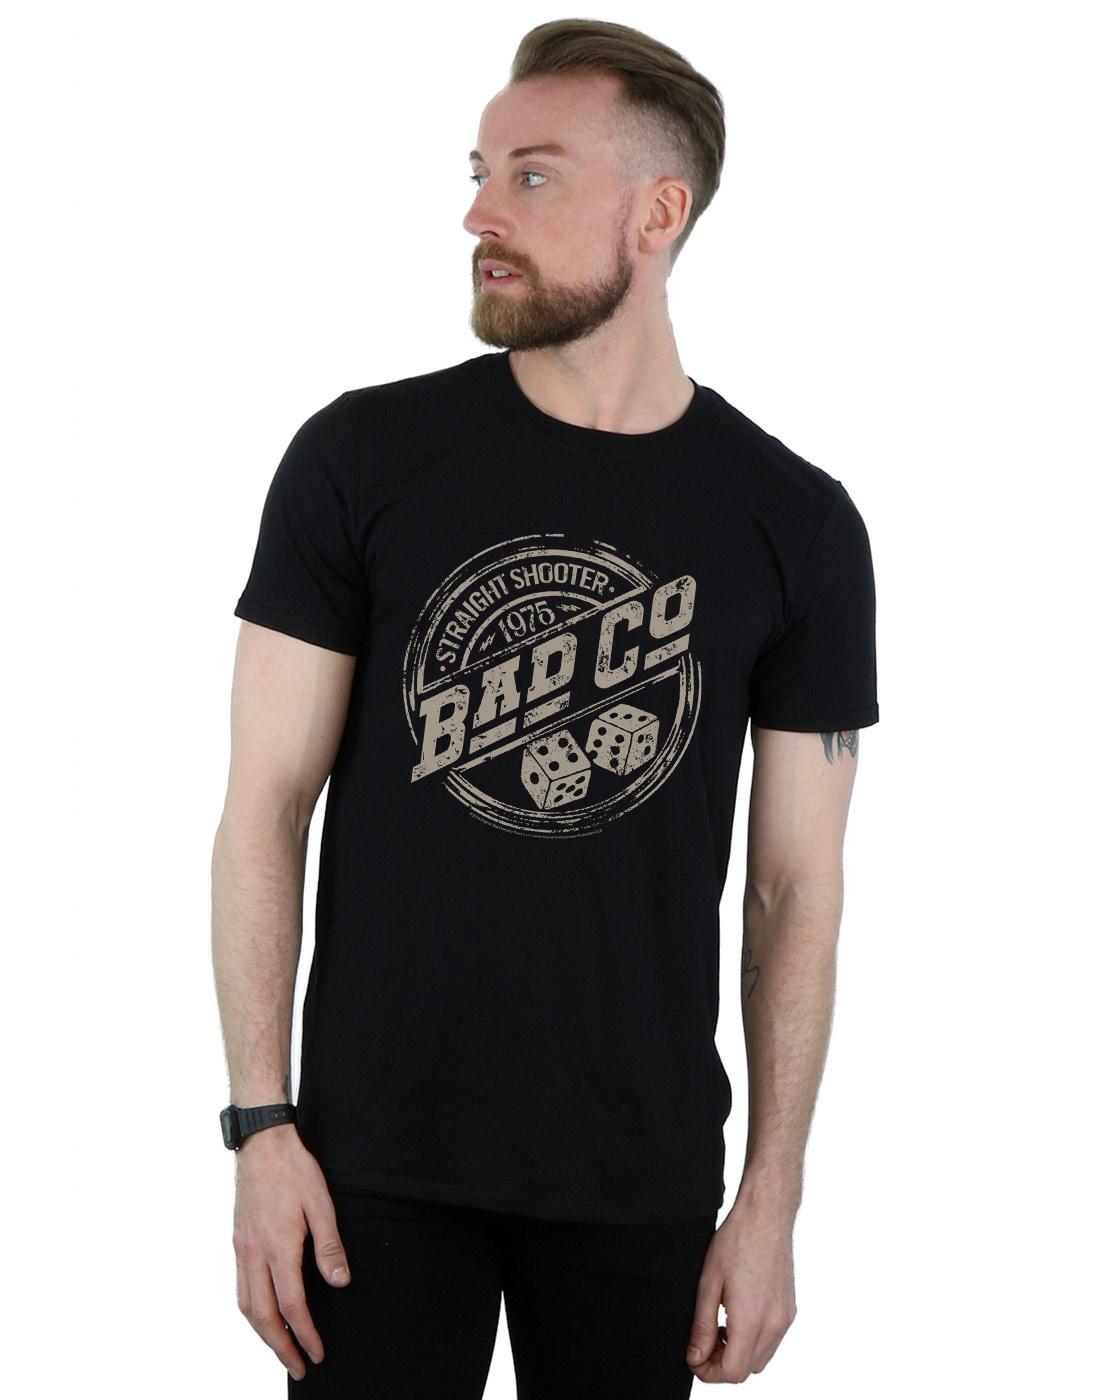 Bad Company Straight Shooter Hard Rock Band Men/'s Black T-Shirt Size S to 3XL